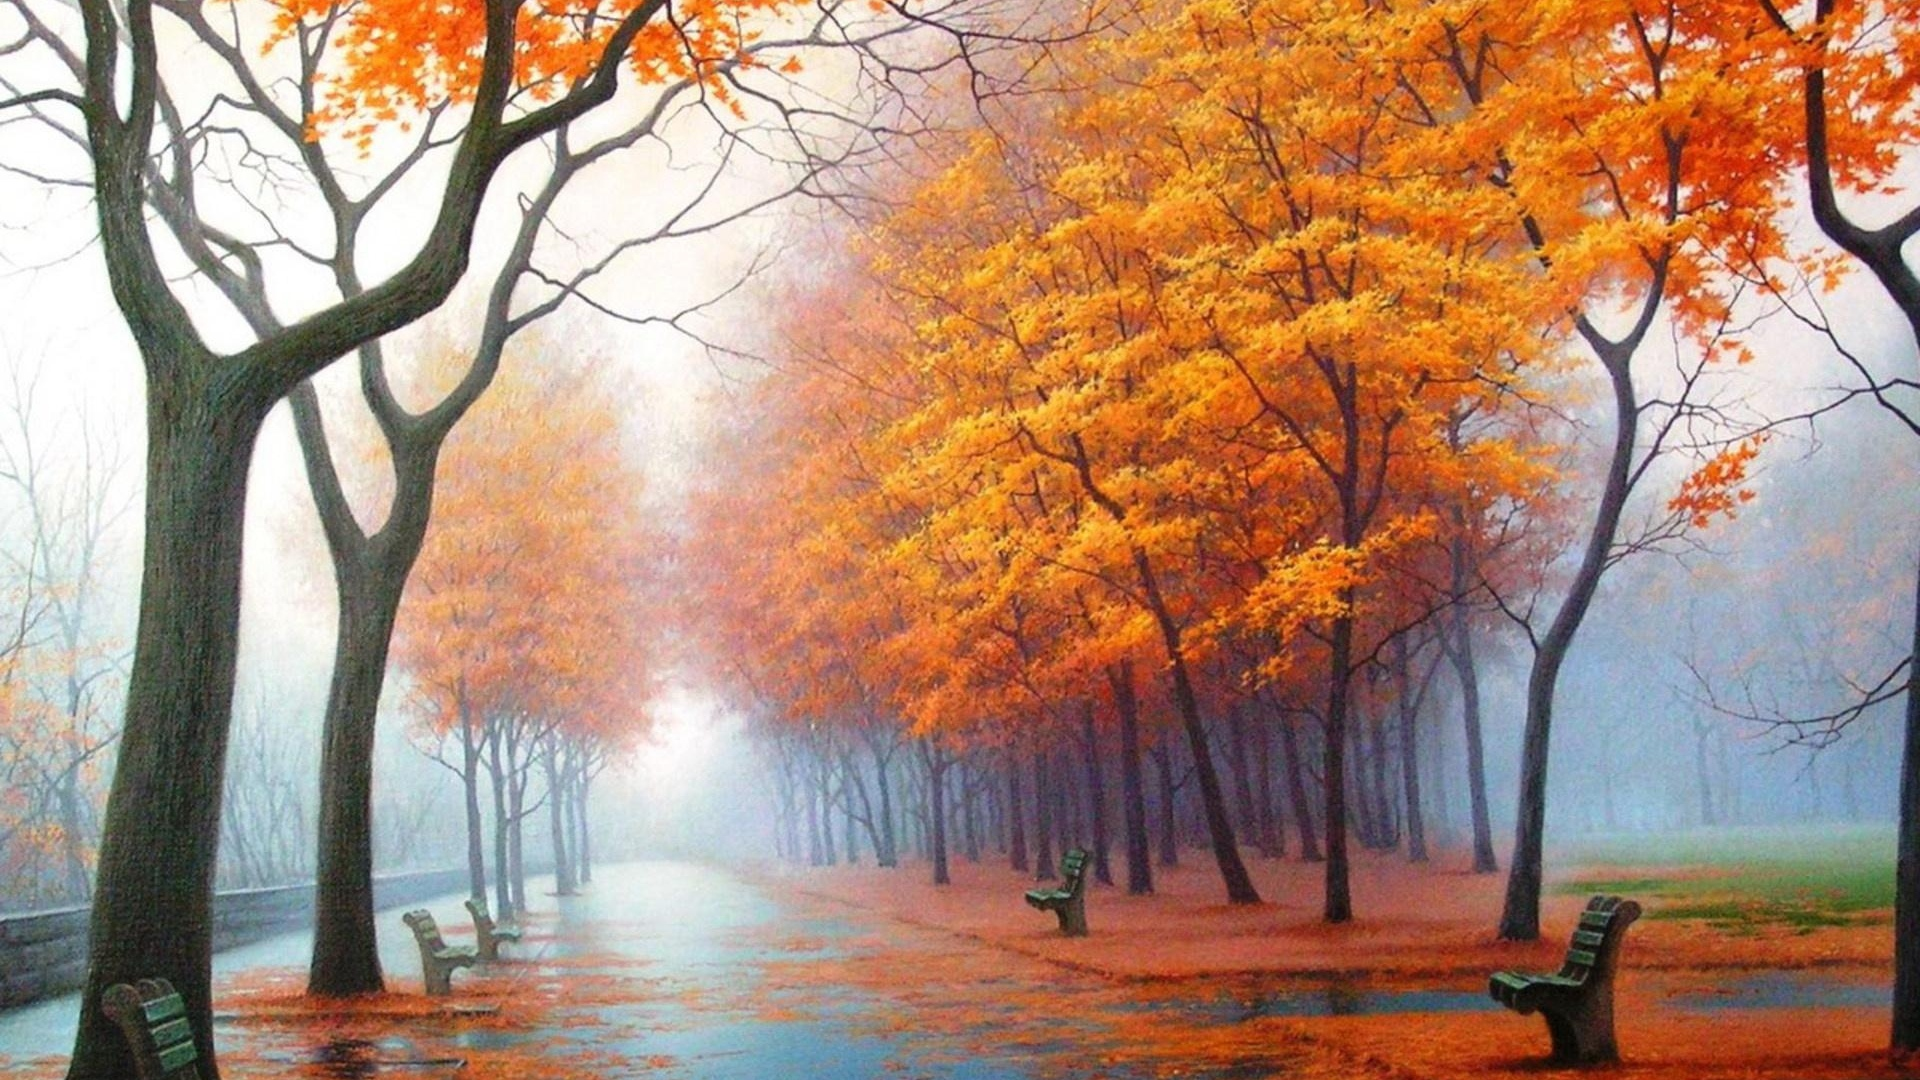 Full HD 1080p Autumn Wallpapers HD, Desktop Backgrounds 1920x1080